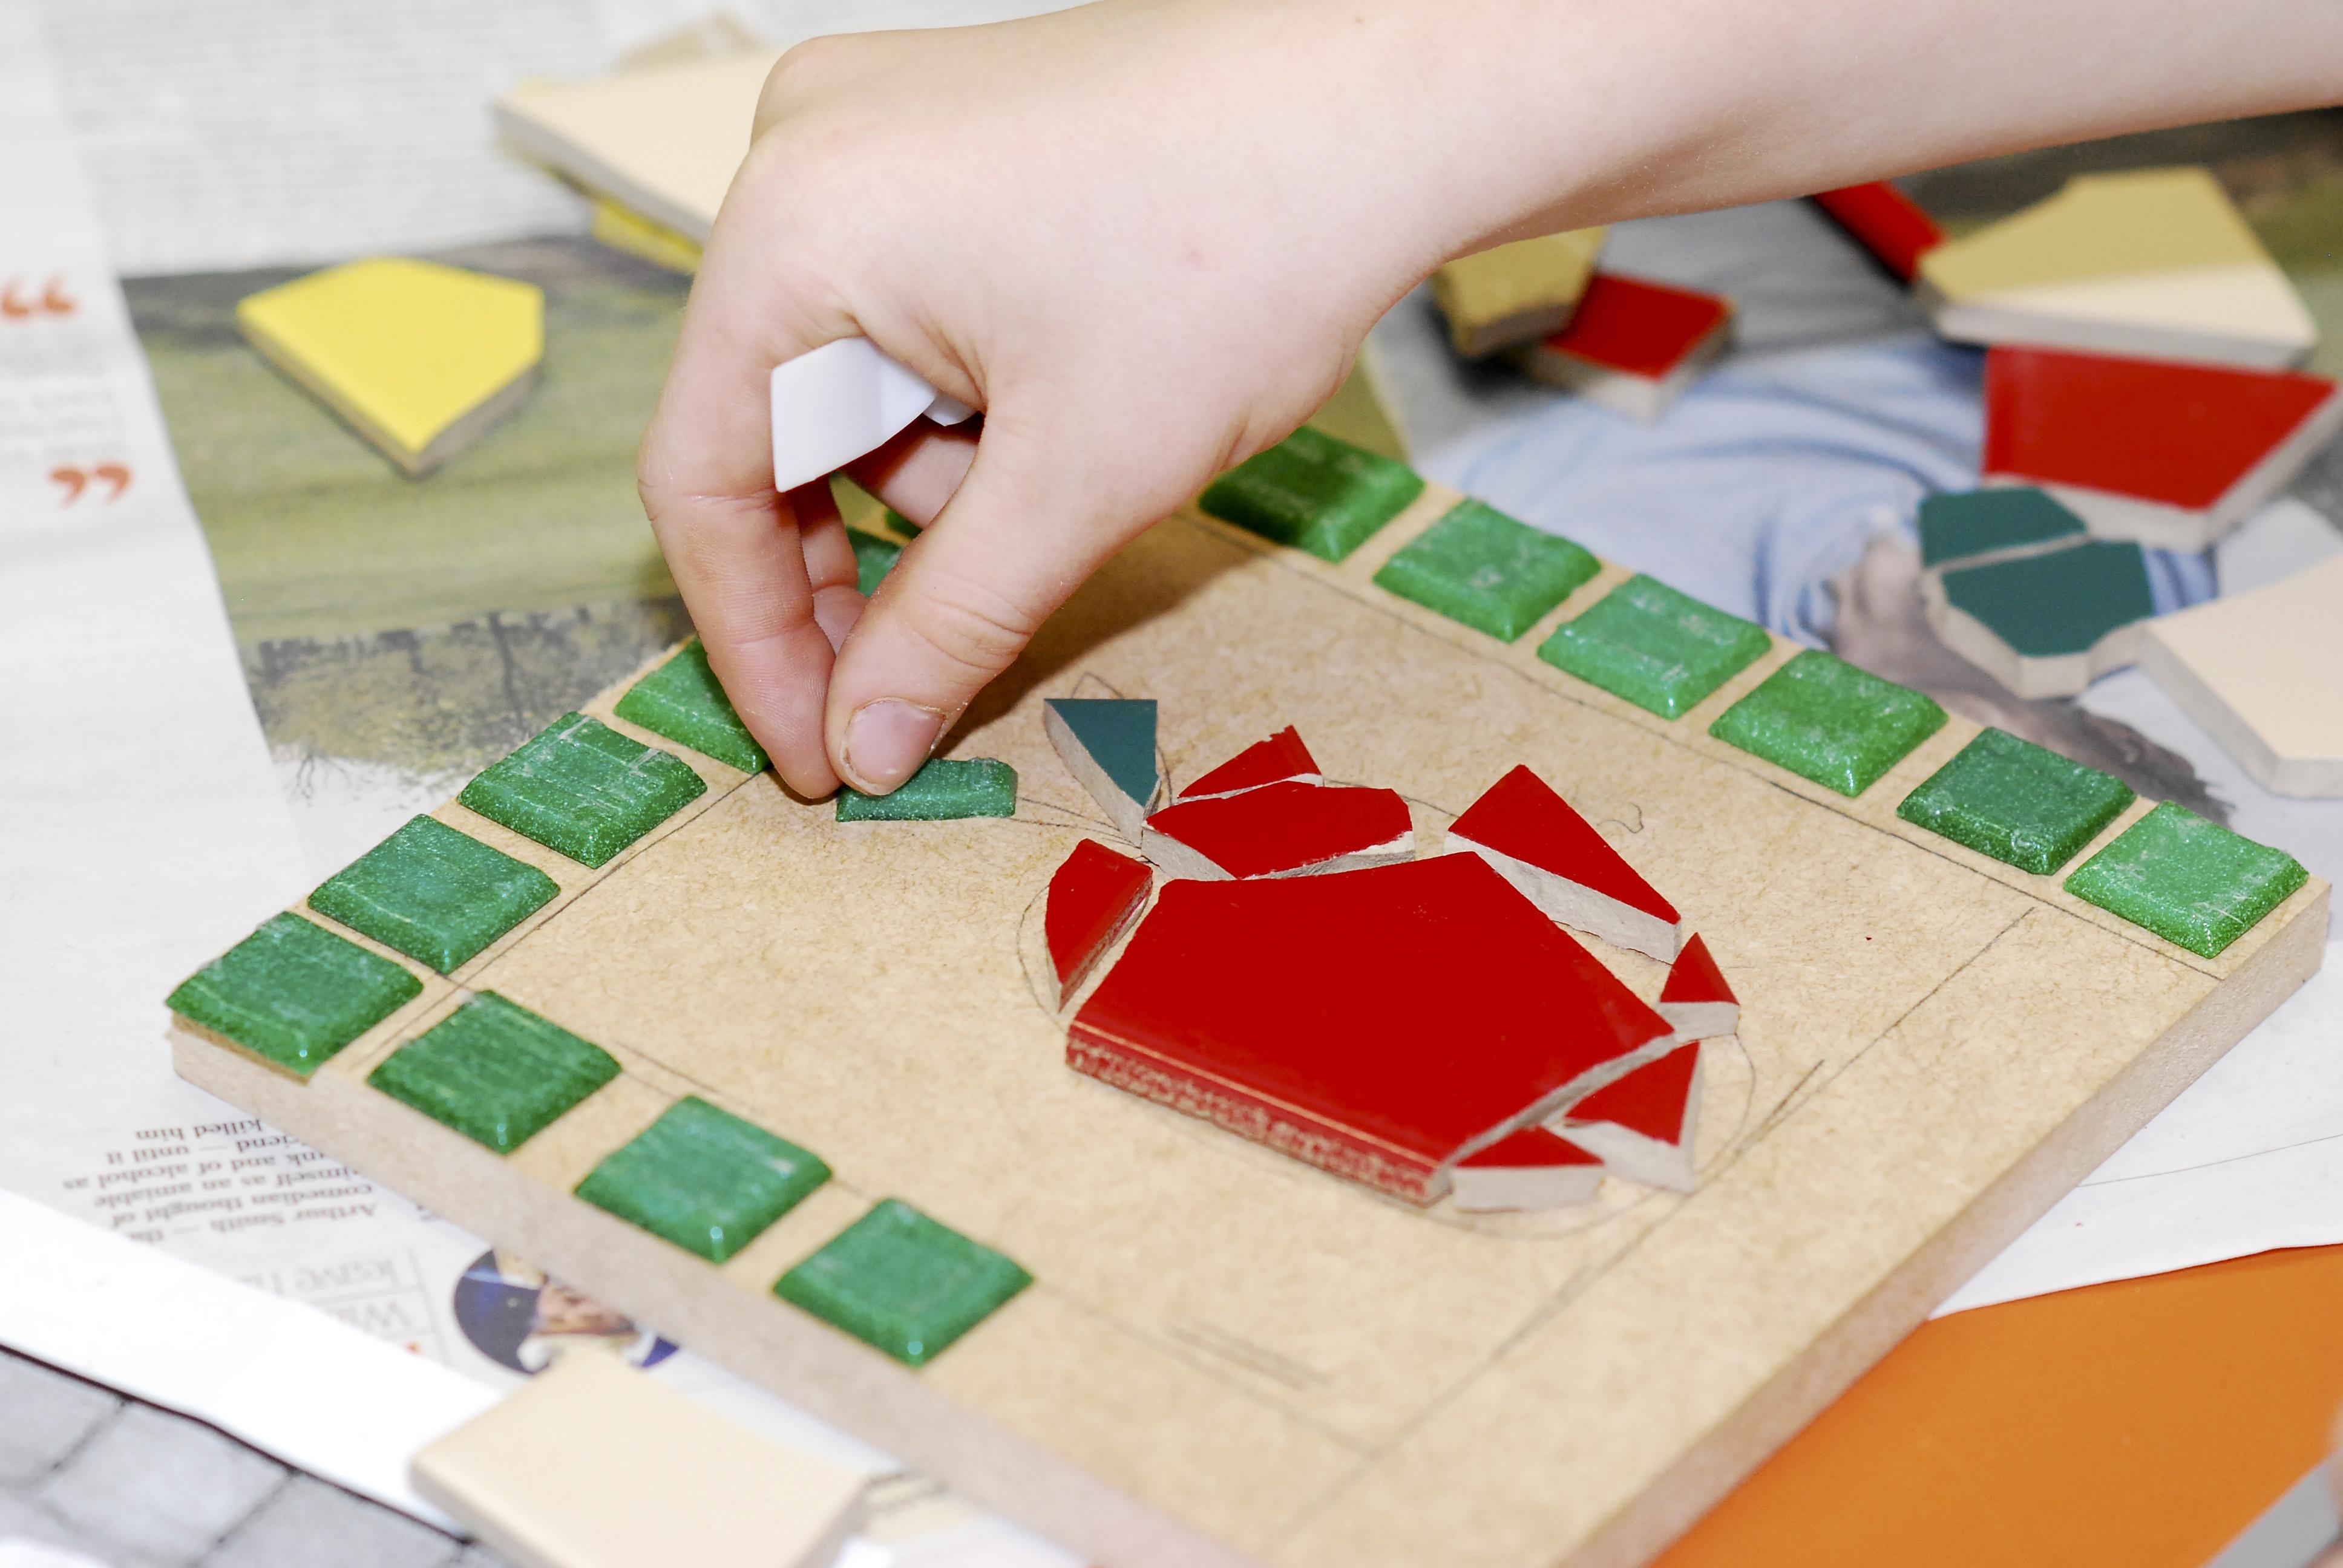 Creating the mosaic design